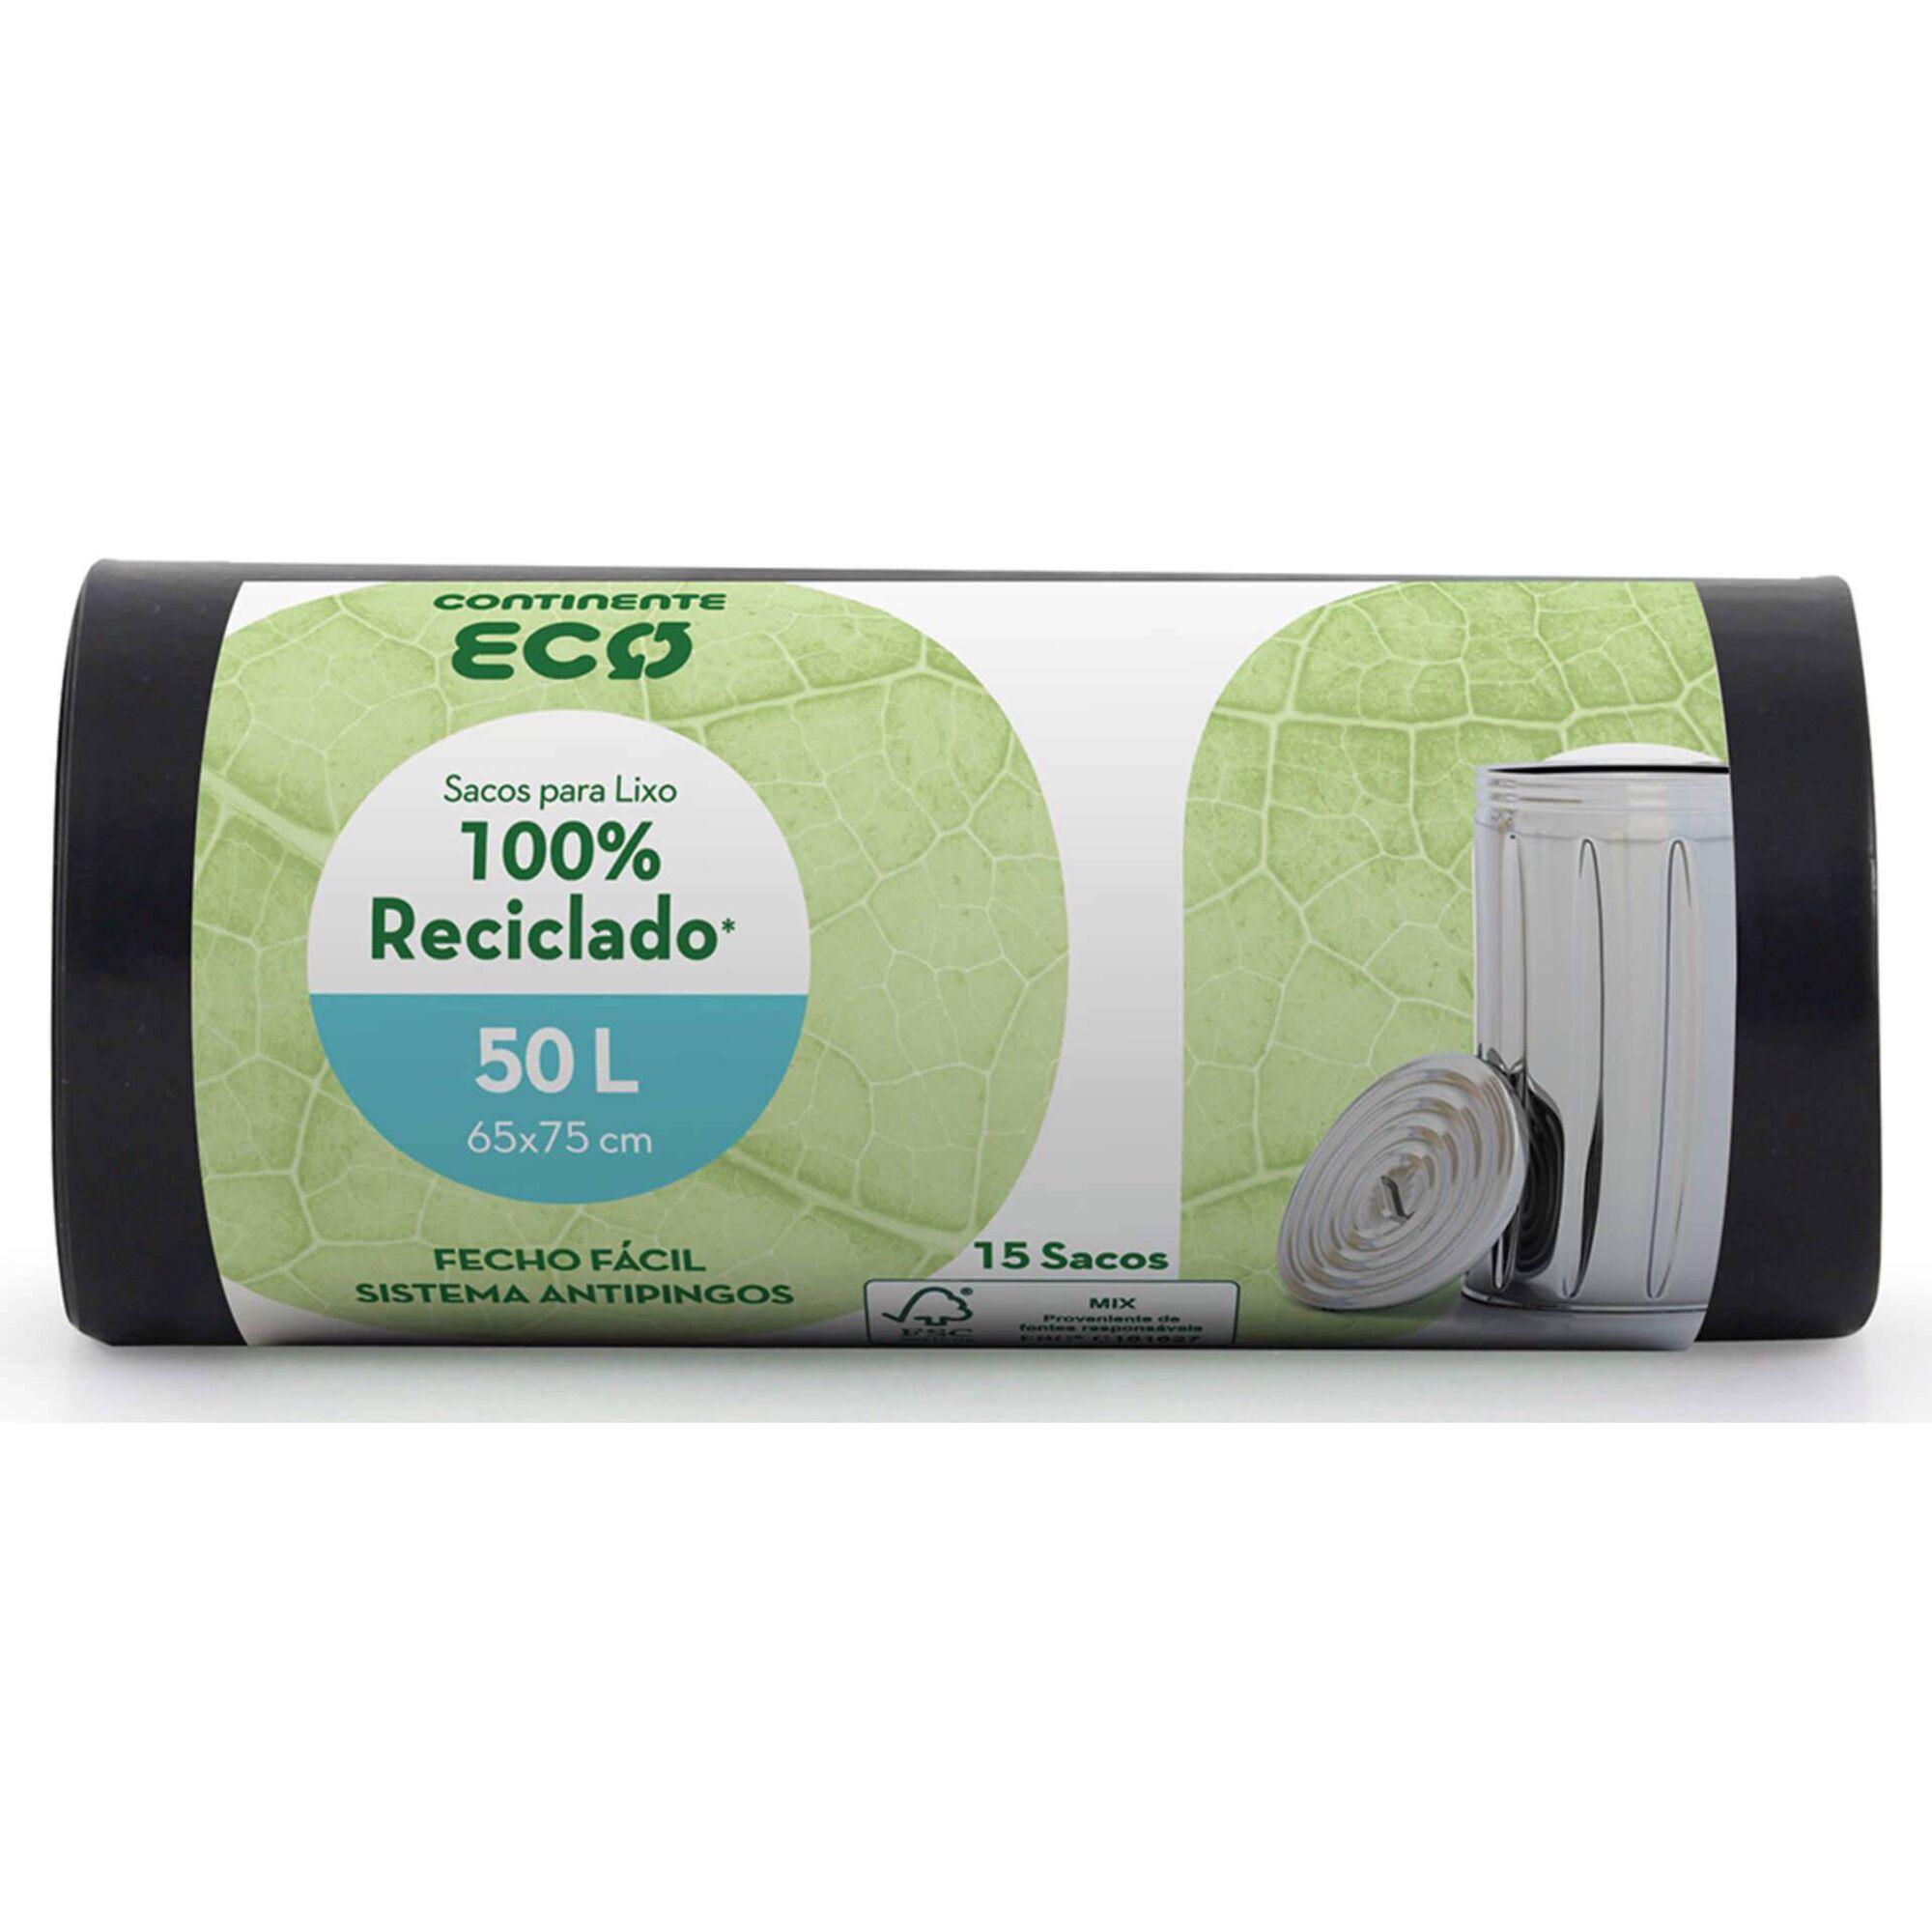 Sacos Lixo 100% Reciclado Fecho Fácil 50 lt